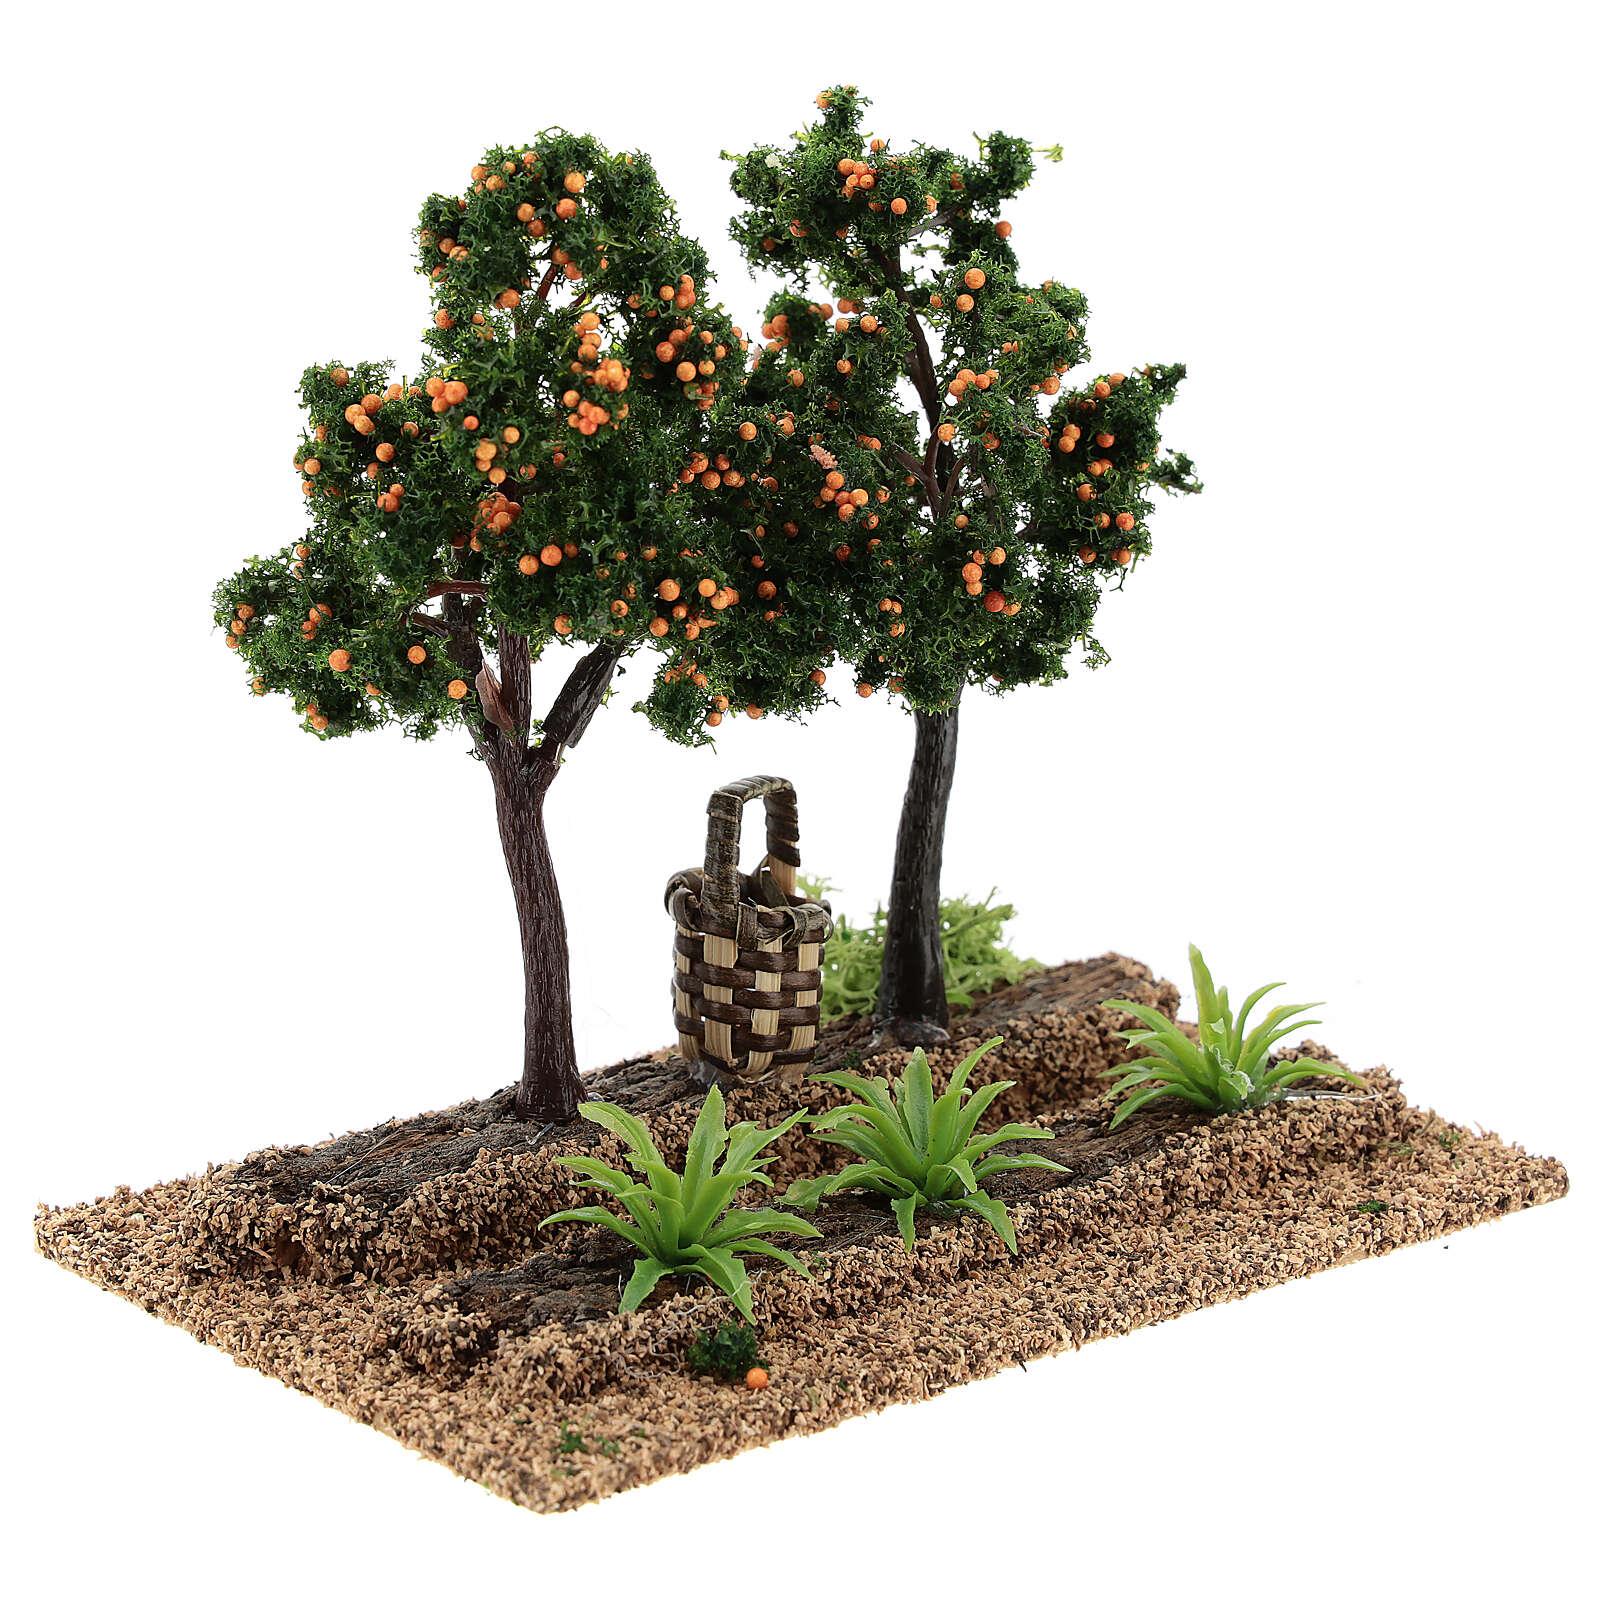 Huerto naranjas 15x15x10 cm belenes 6-8 cm 4